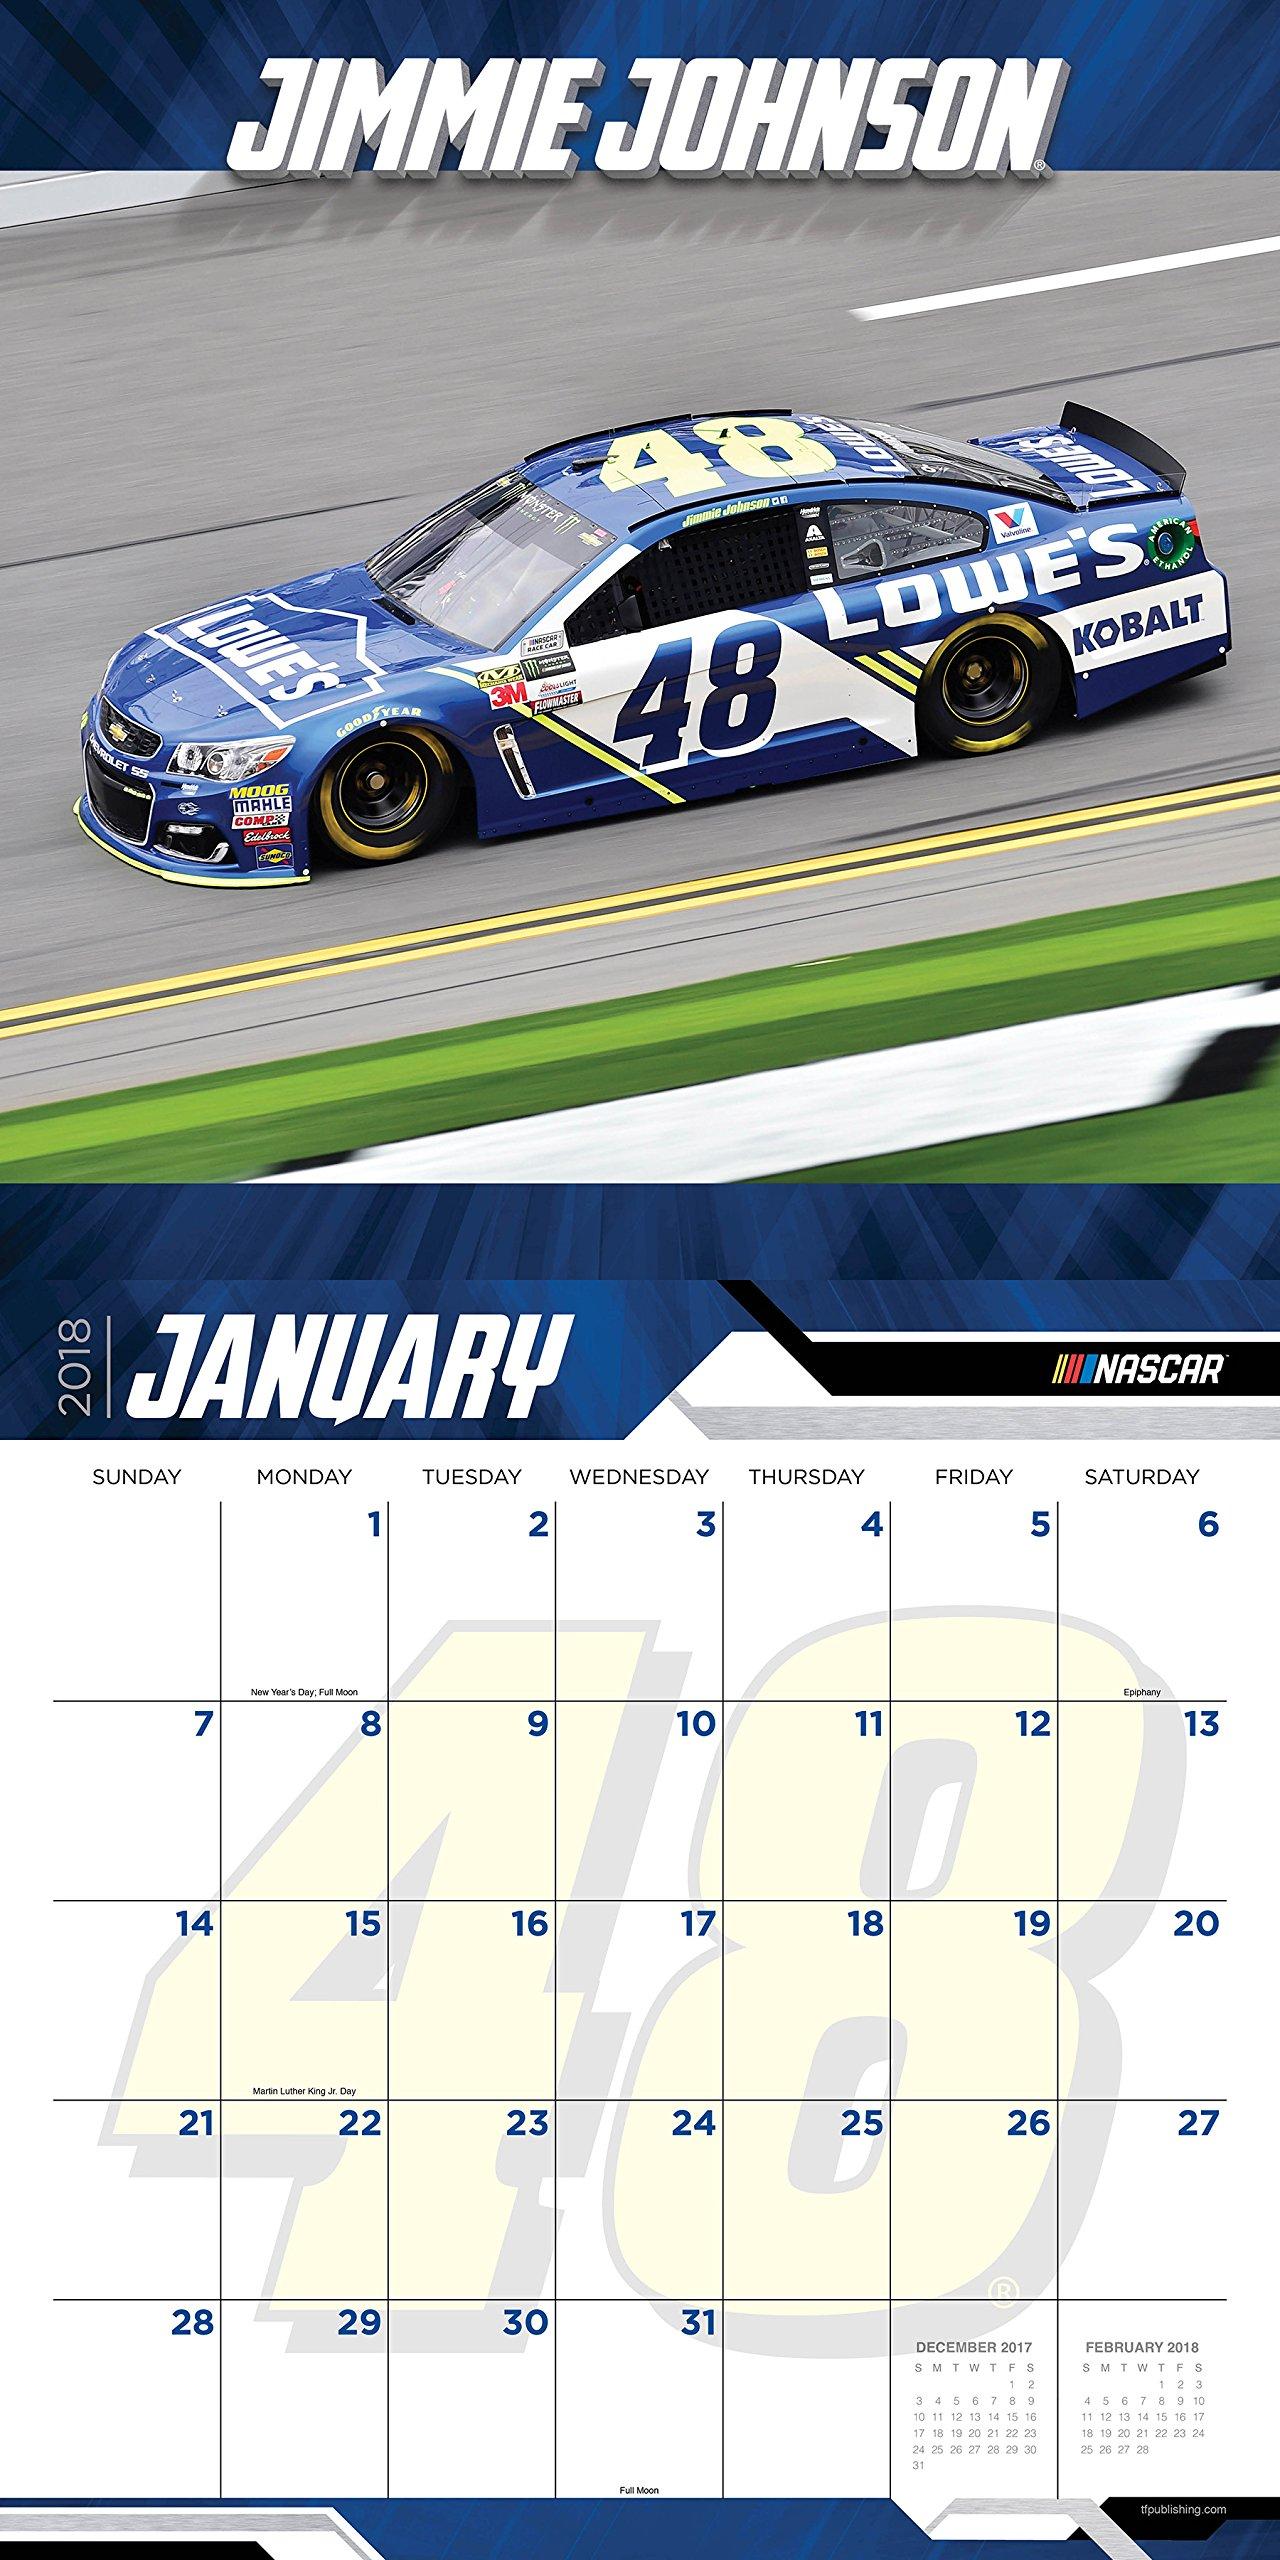 2018 Jimmie Johnson Wall Calendar: Jimmie Johnson: 9781683750833:  Amazon.com: Books